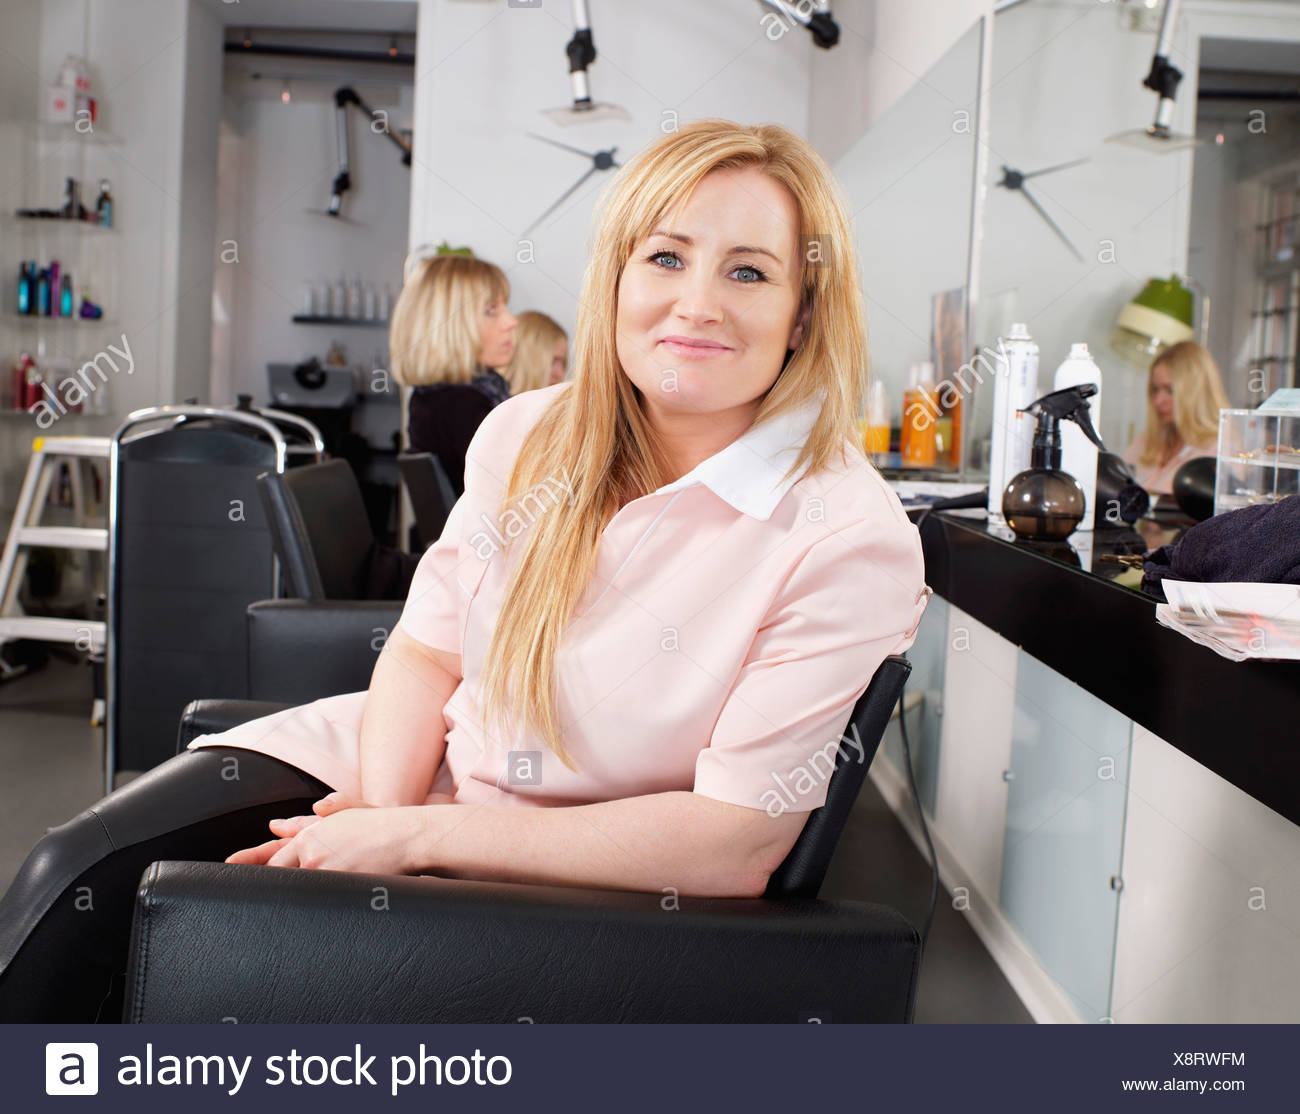 Hairdresser sitting in salon chair - Stock Image